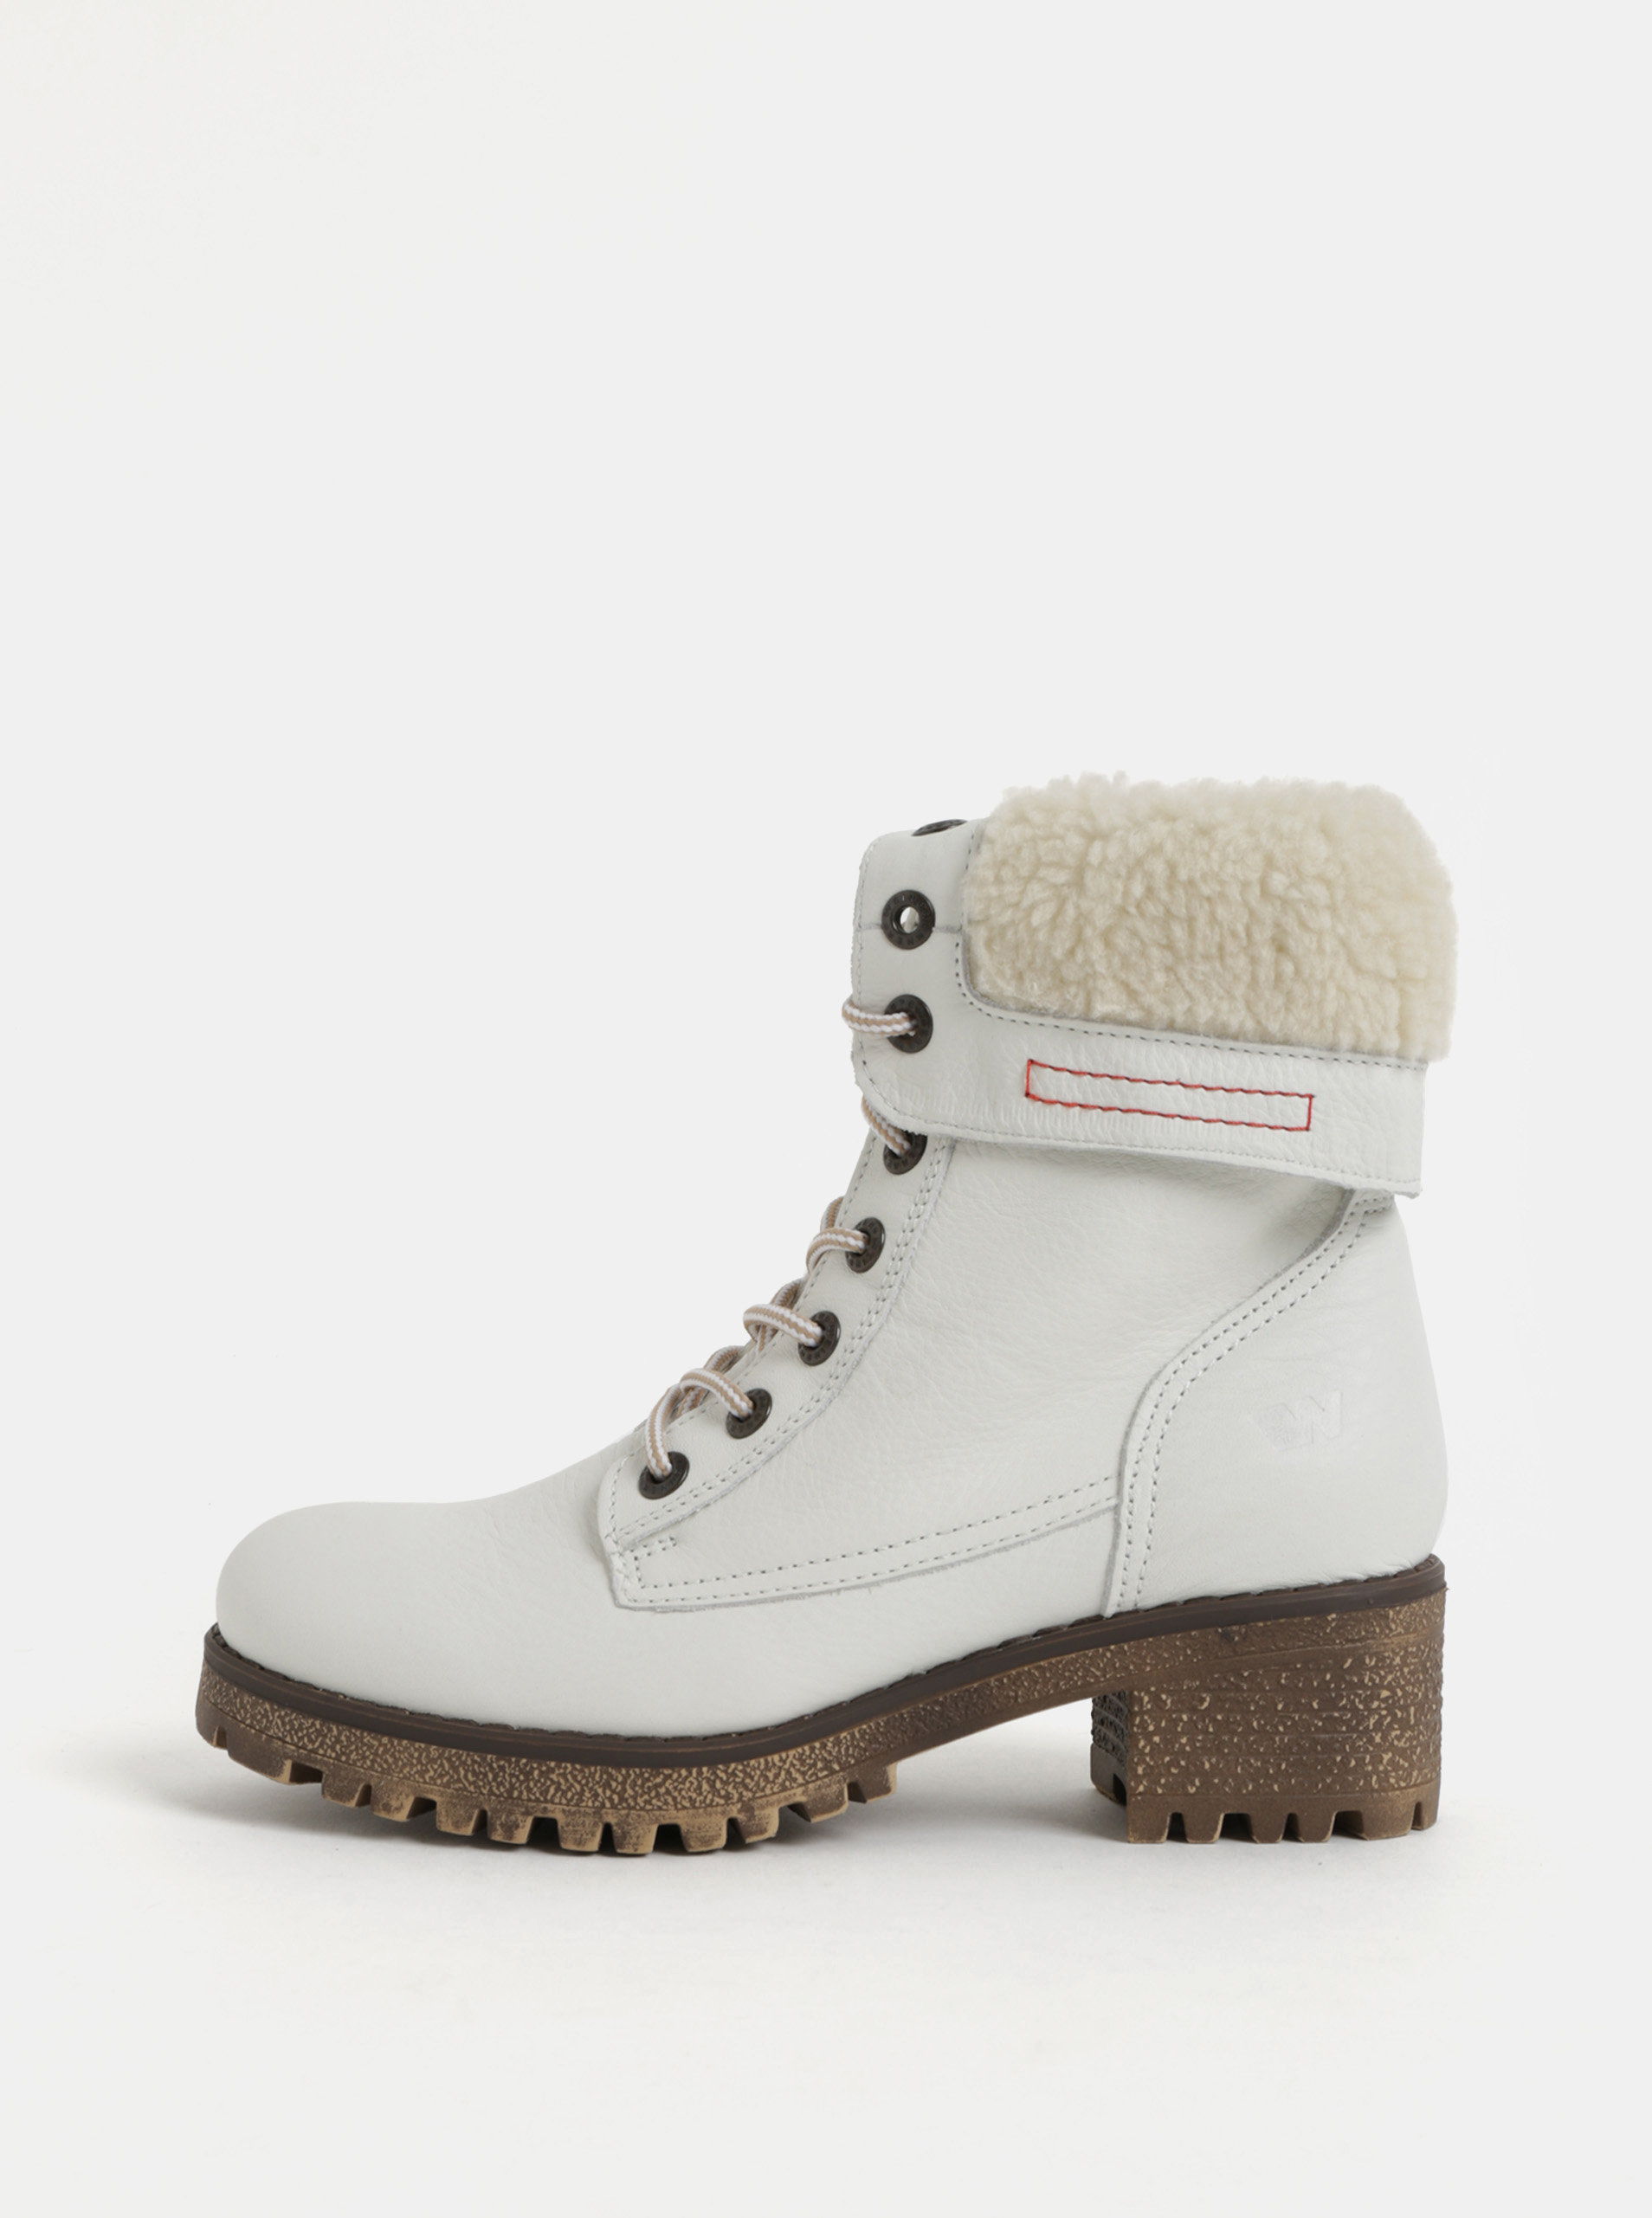 aeeffd811b27d Biele dámske kožené členkové zimné topánky na podpätku Weinbrenner ...